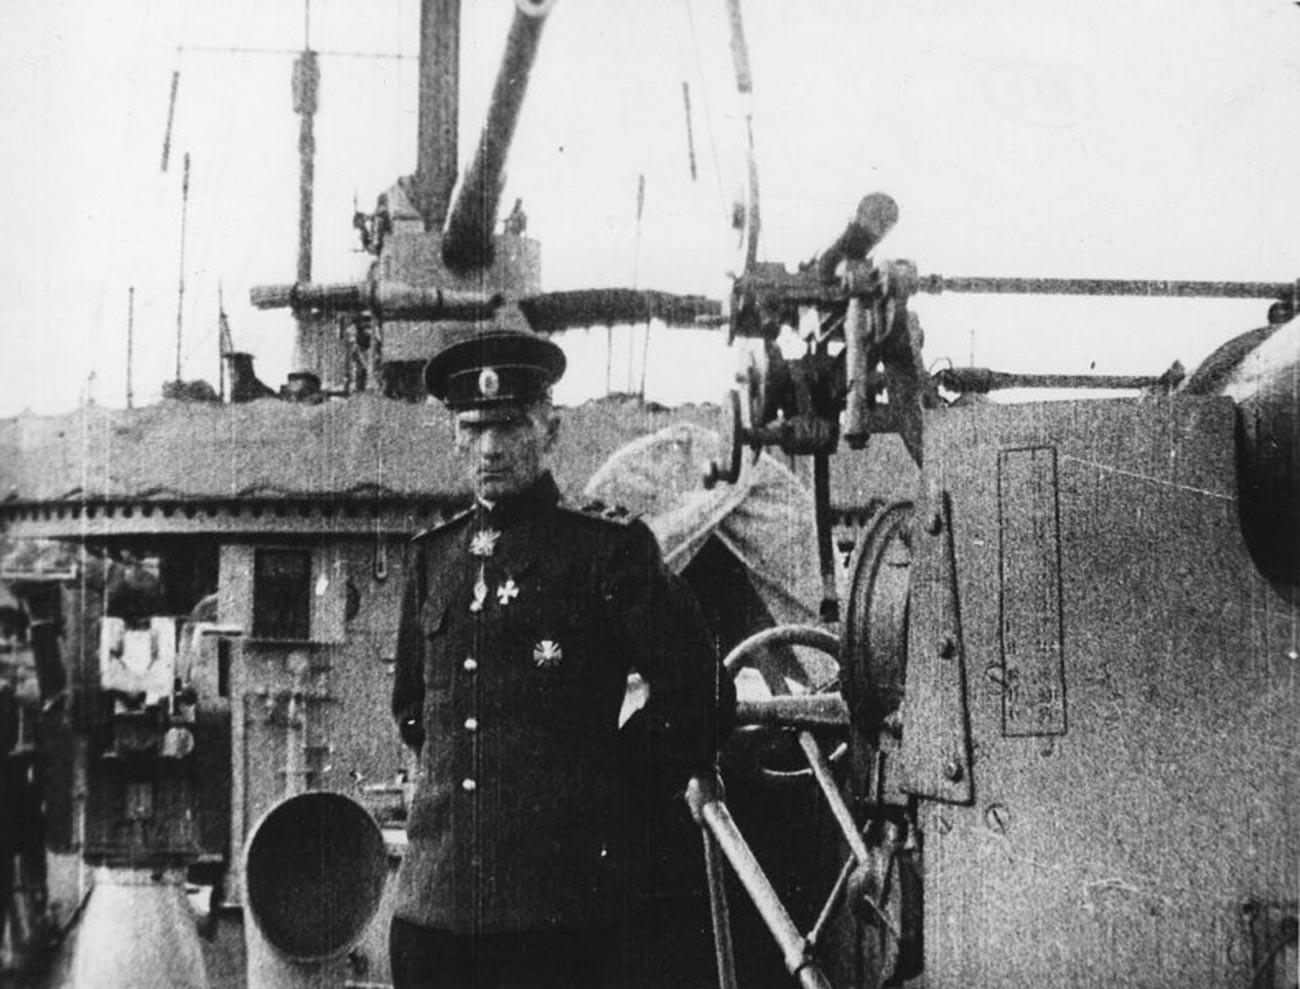 Zapovjednik Crnomorske flote Aleksandar Kolčak